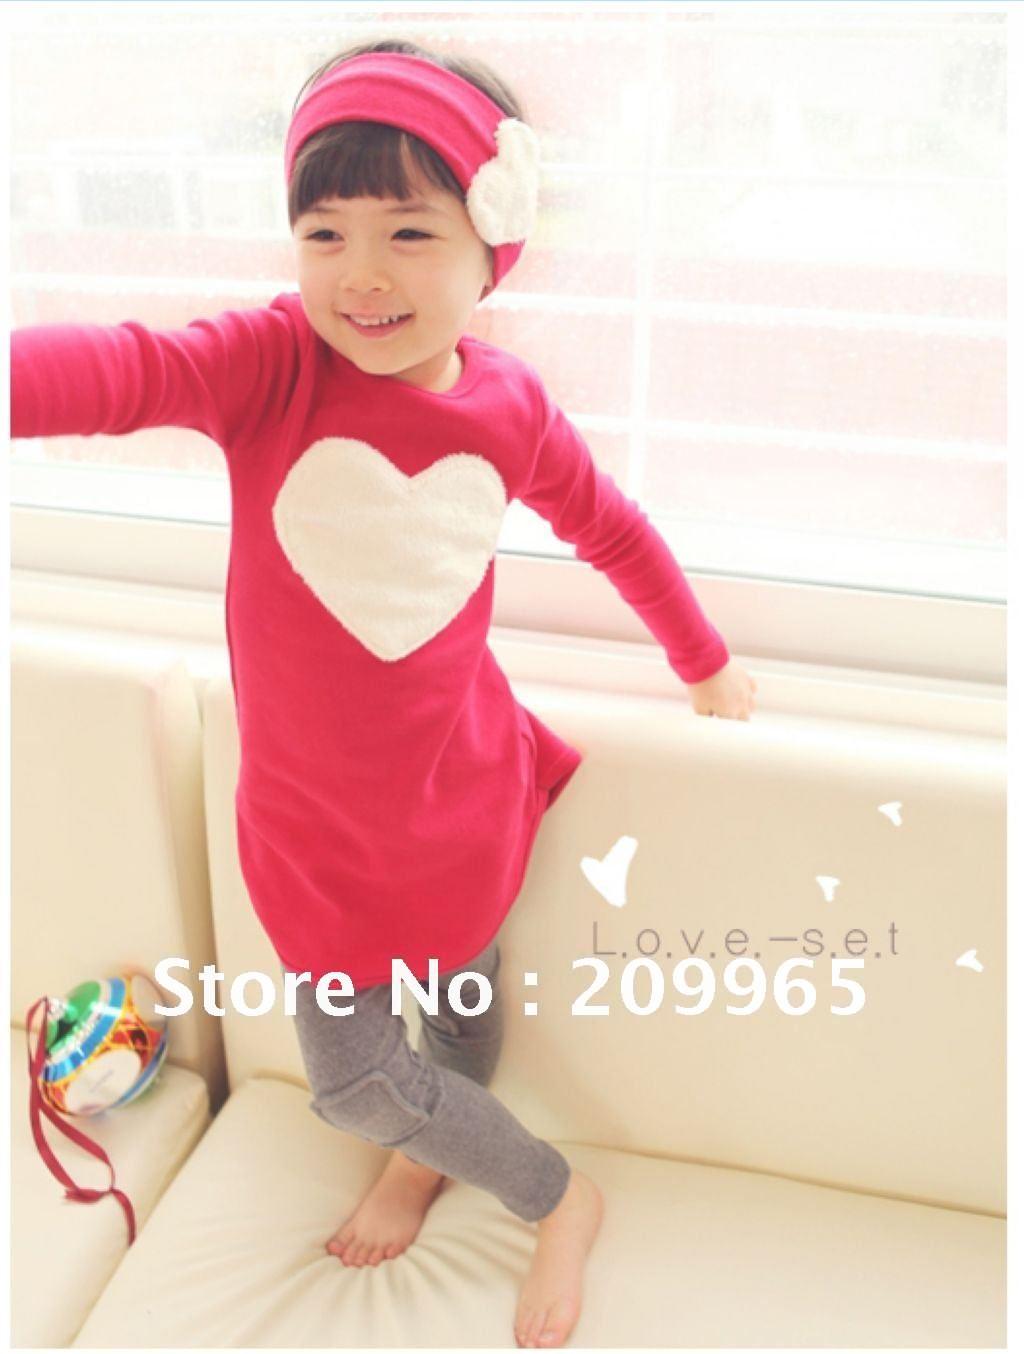 http://i00.i.aliimg.com/wsphoto/v0/535294026/5pcs-Wholesale-Girl-Sets-Baby-Suit-Kids-Set-Toddlers-3-Piece-Set-Princess-Dress-Girl-Pants.jpg